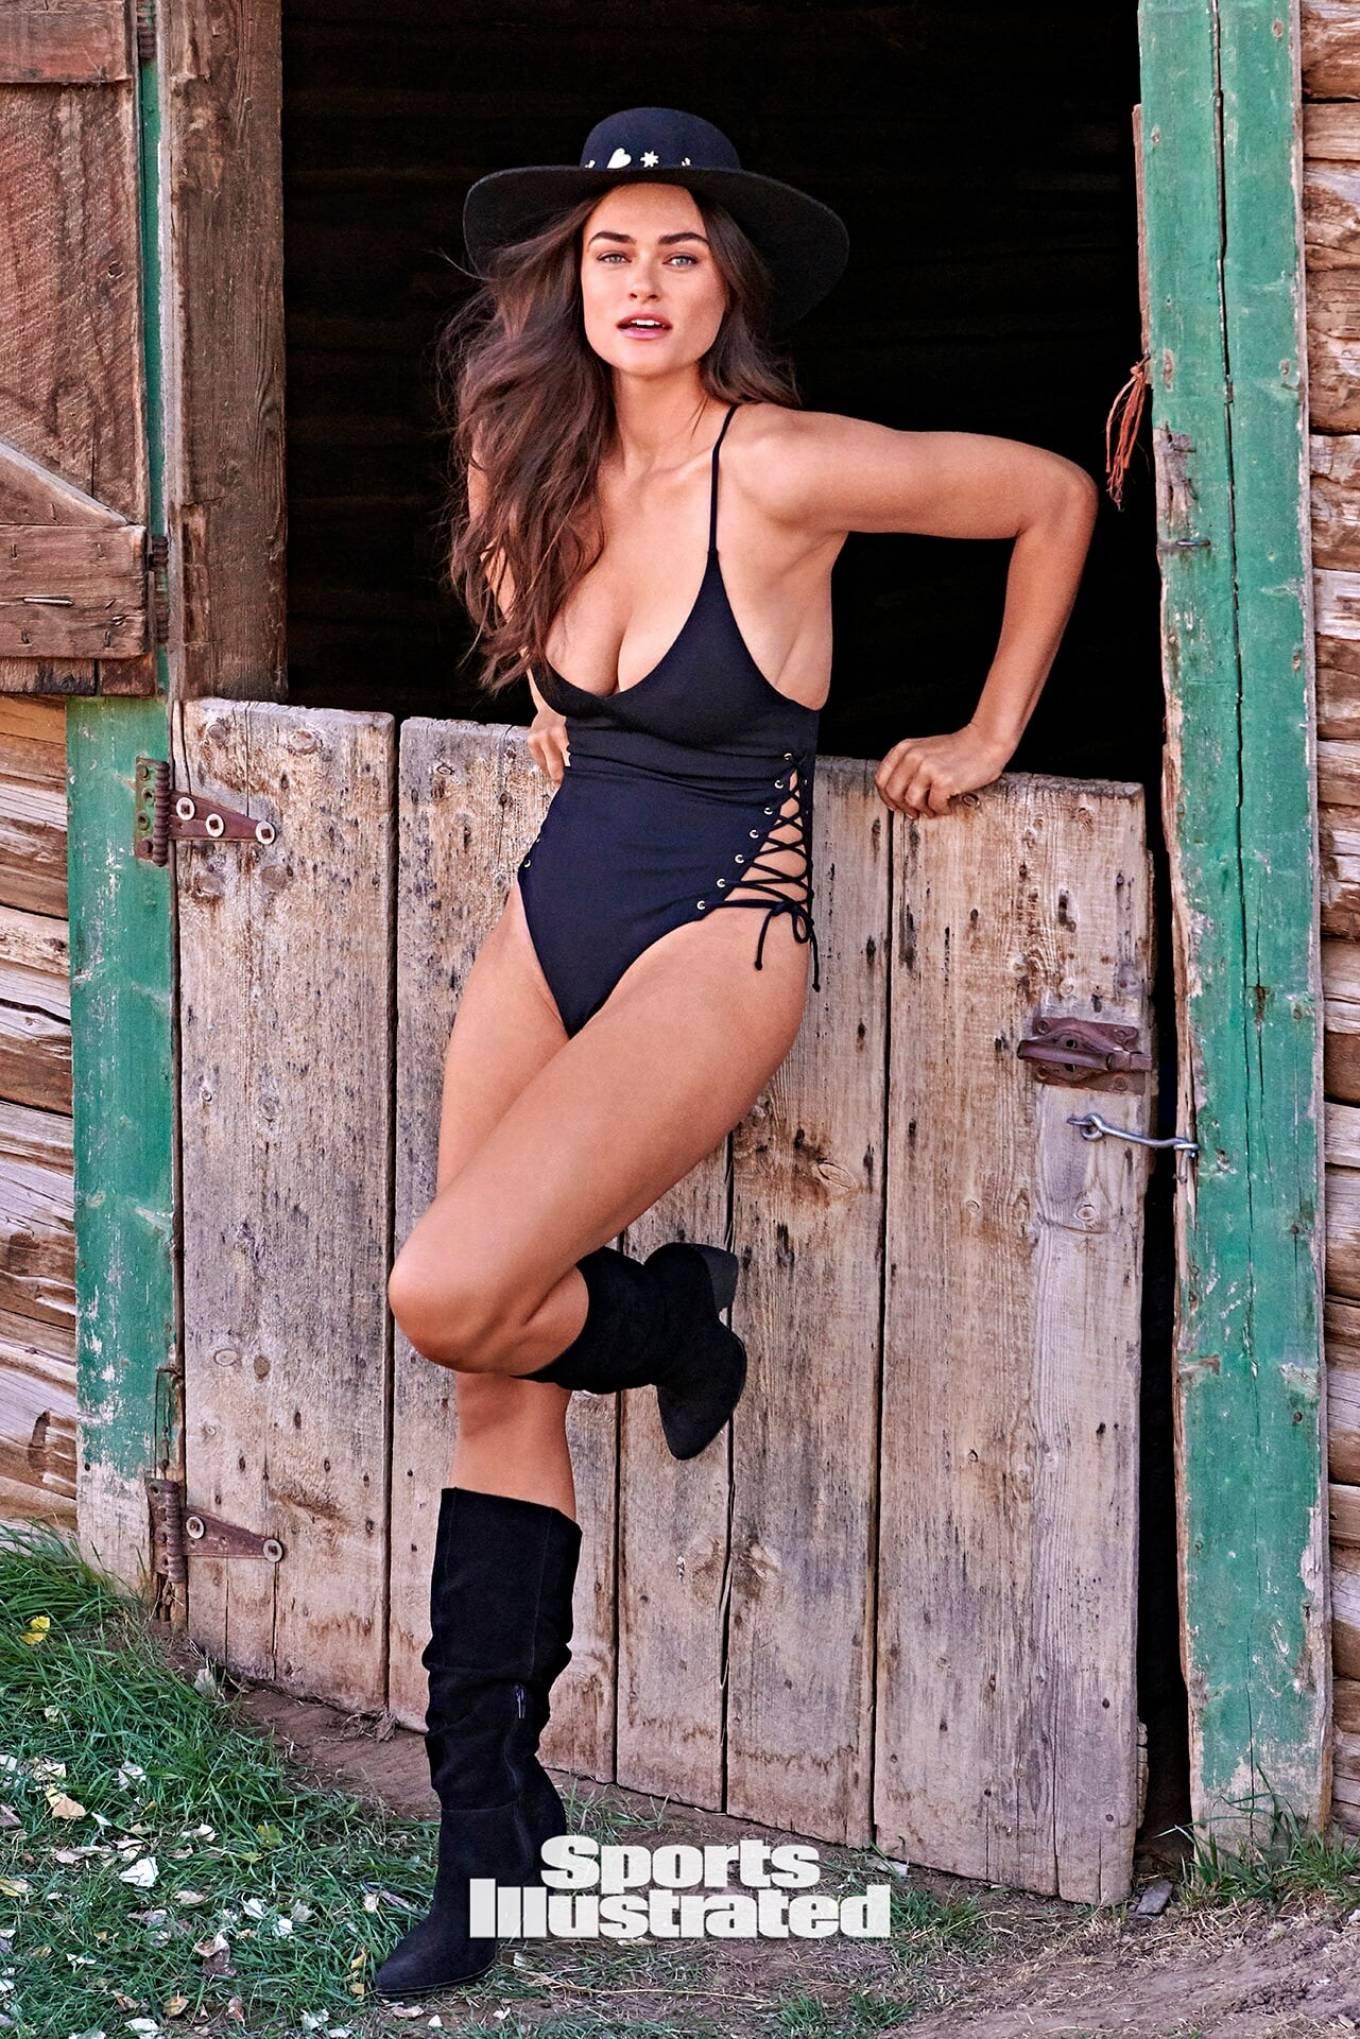 Sports Illustrated: Swimsuit Edition - Myla Dalbesio 20